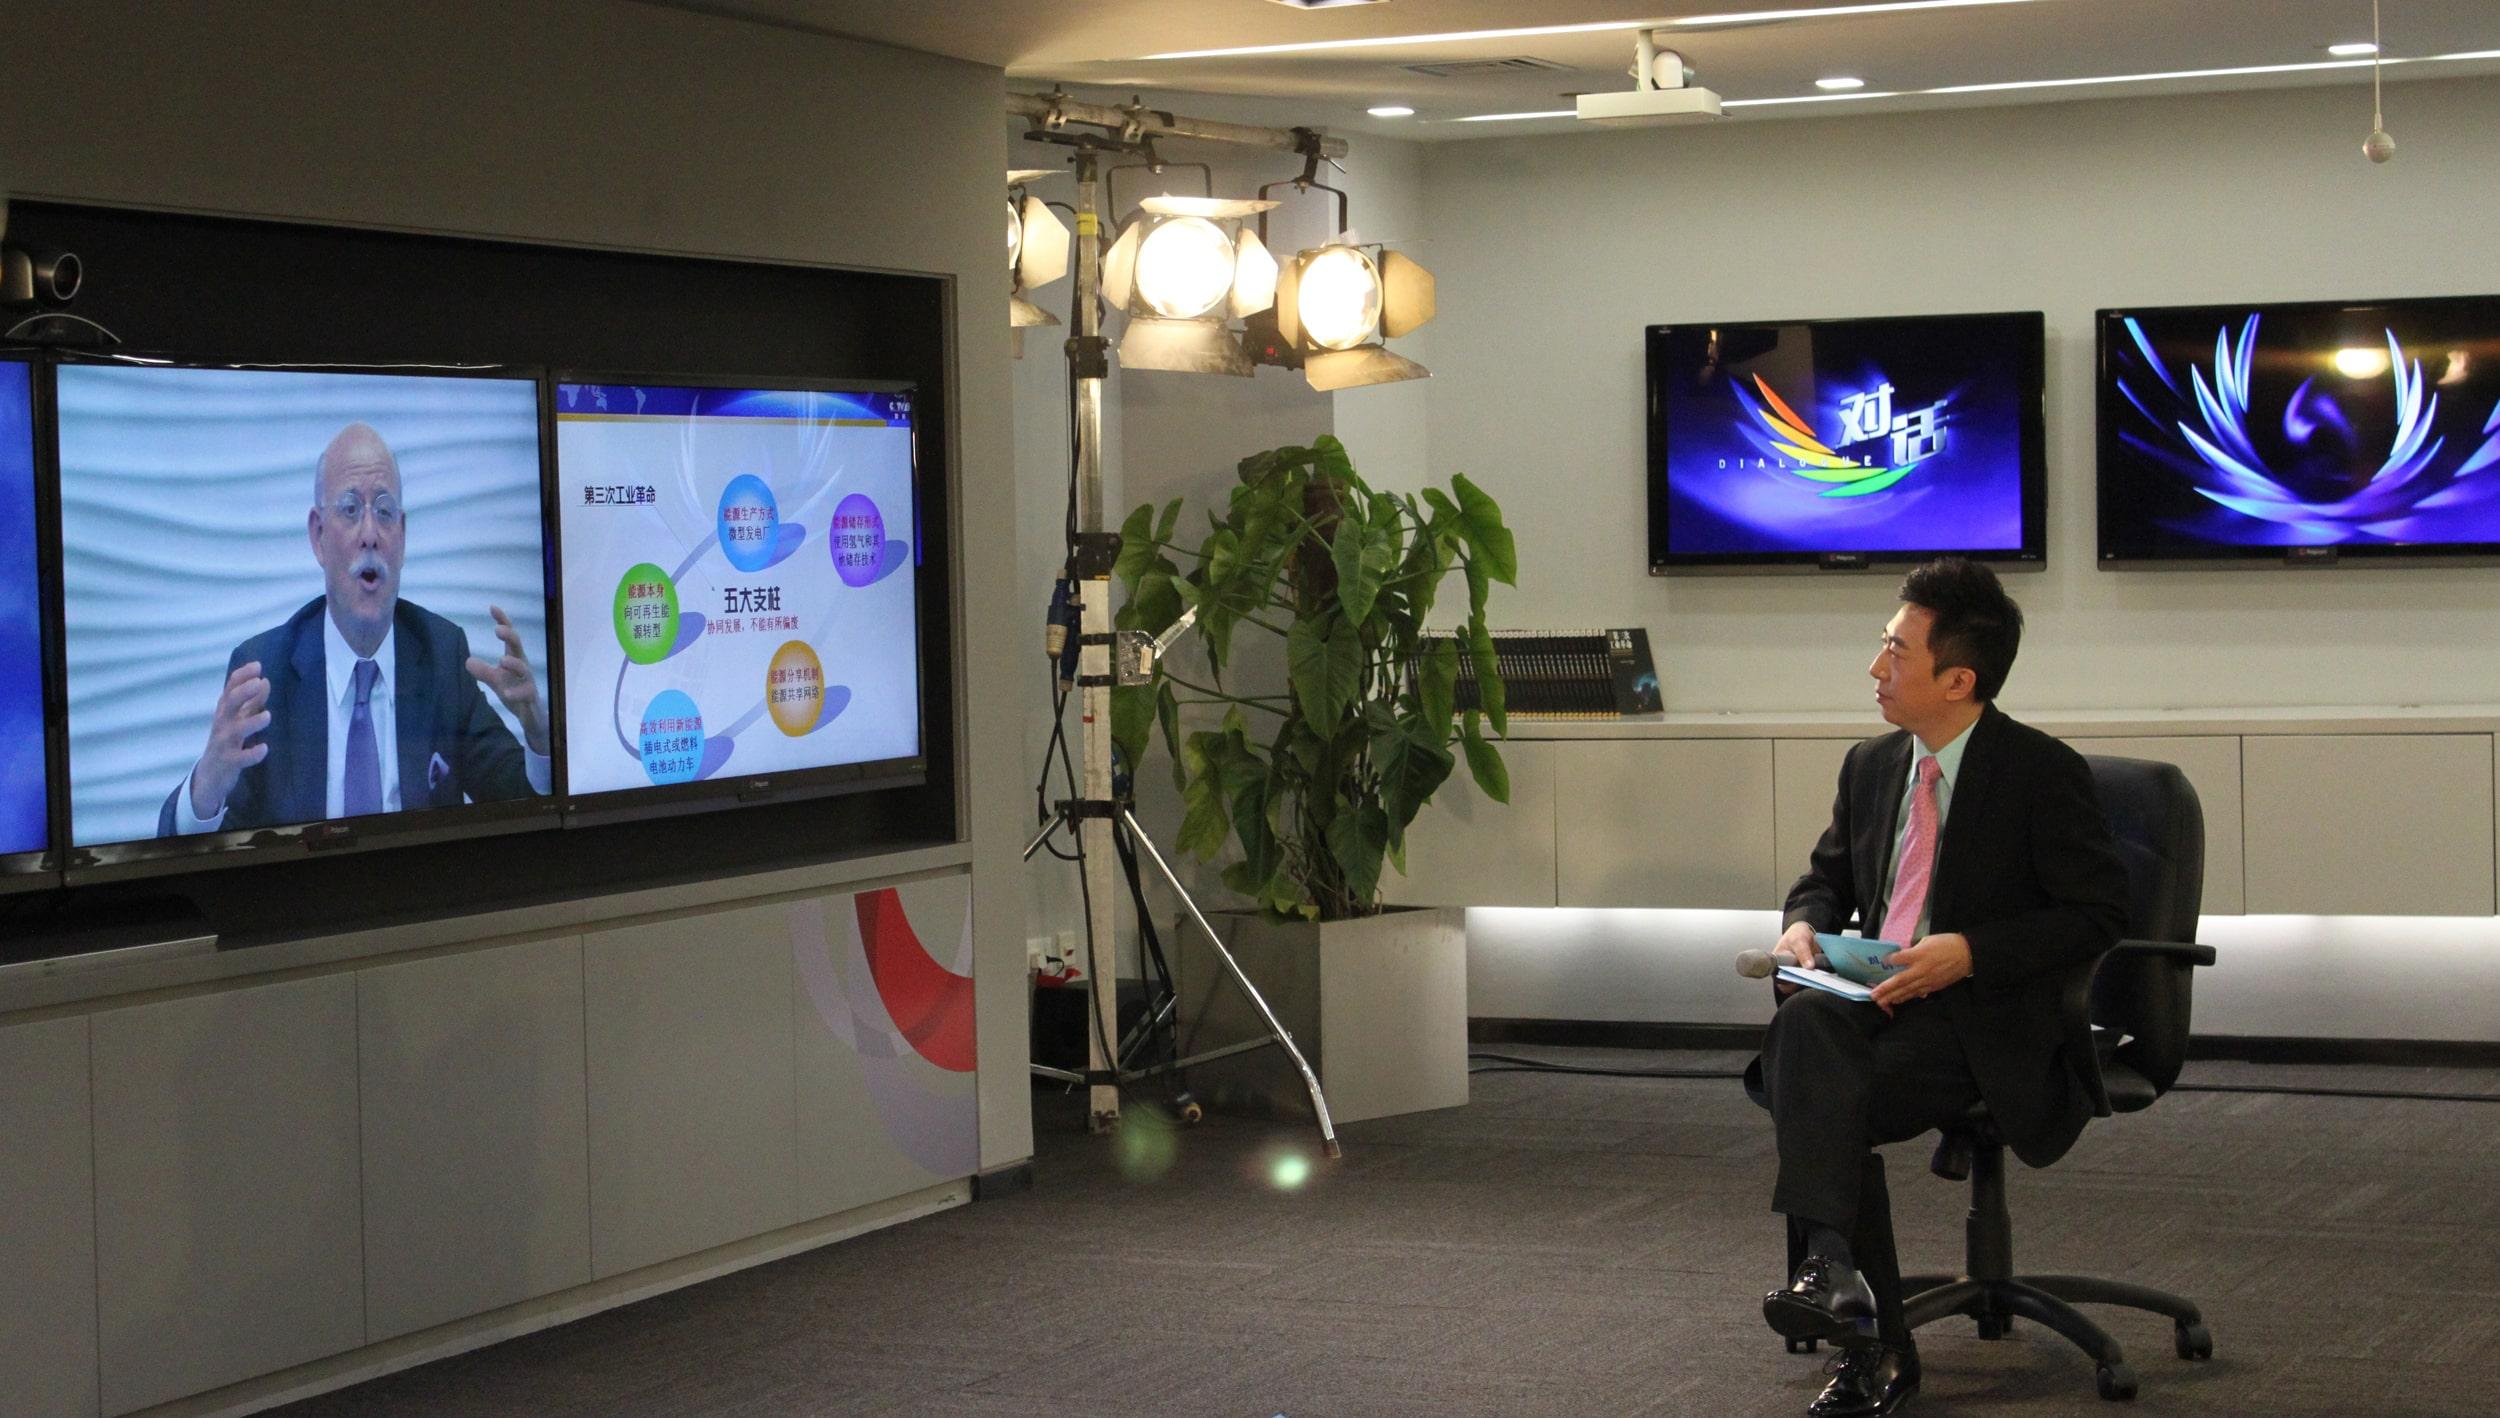 Contoh Dialog Interaktif Singkat di Televisi